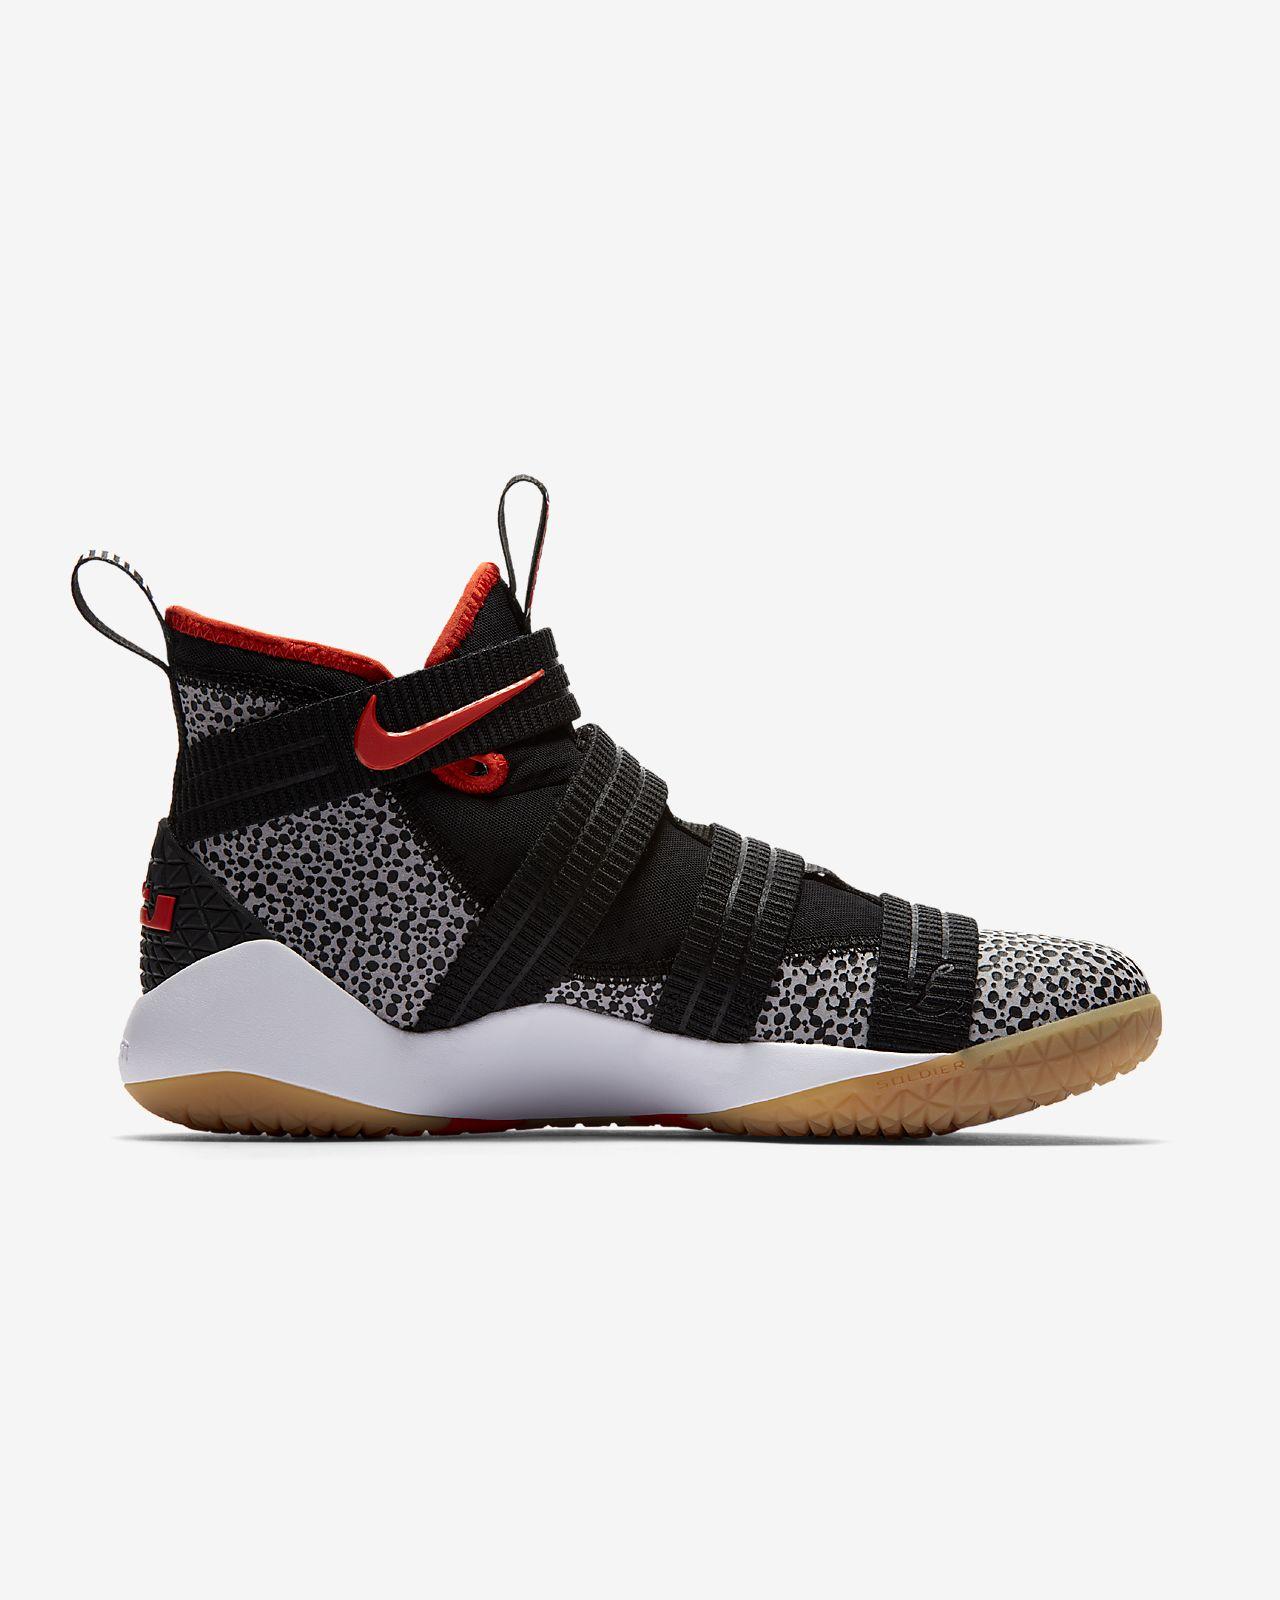 ... LeBron Soldier XI SFG Basketball Shoe